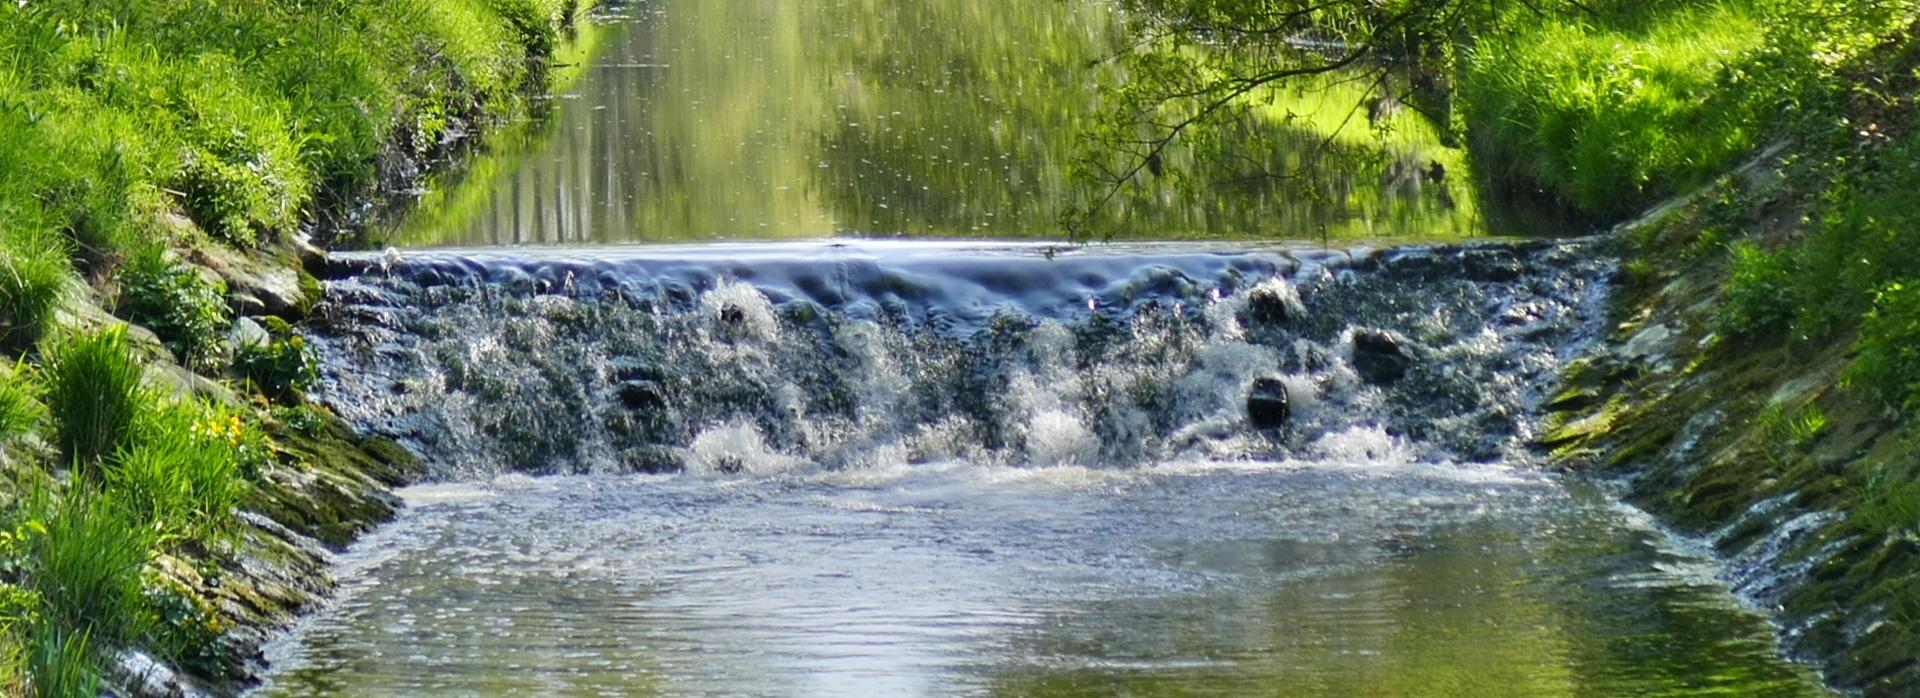 Wasserfall Dinkel